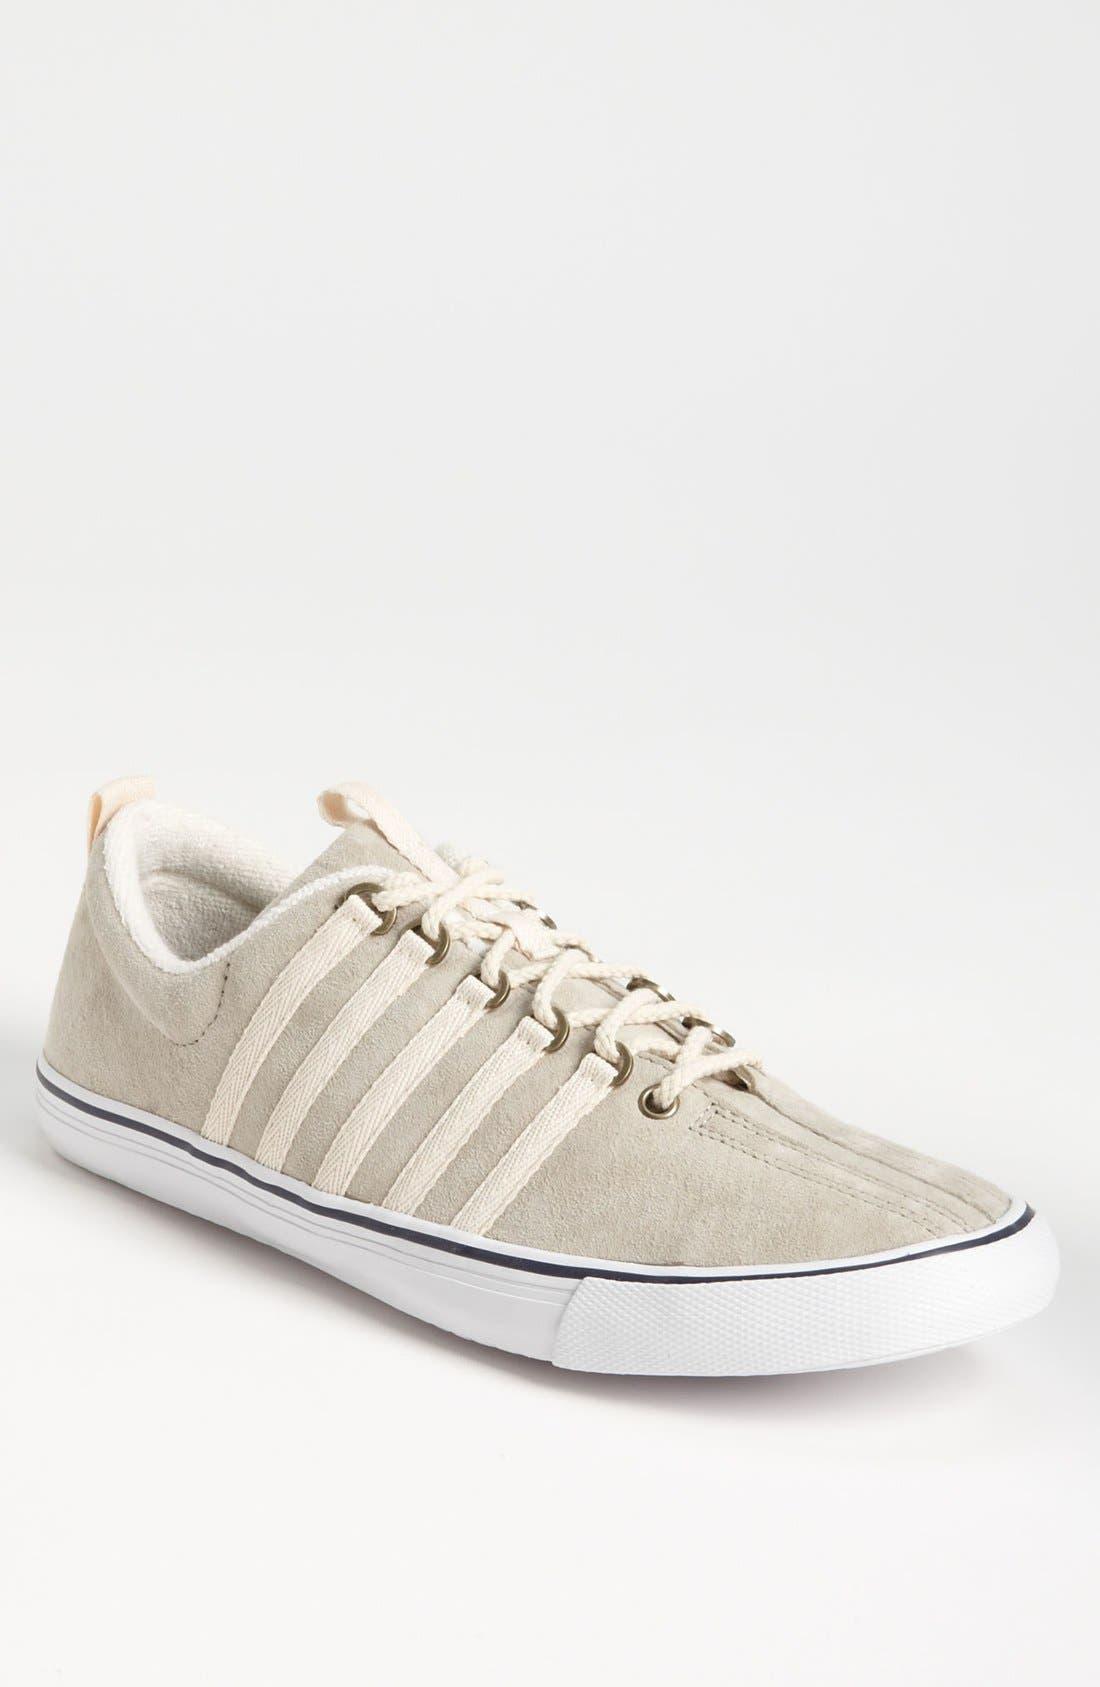 'Billy Reid Venice' Suede Sneaker, Main, color, 052